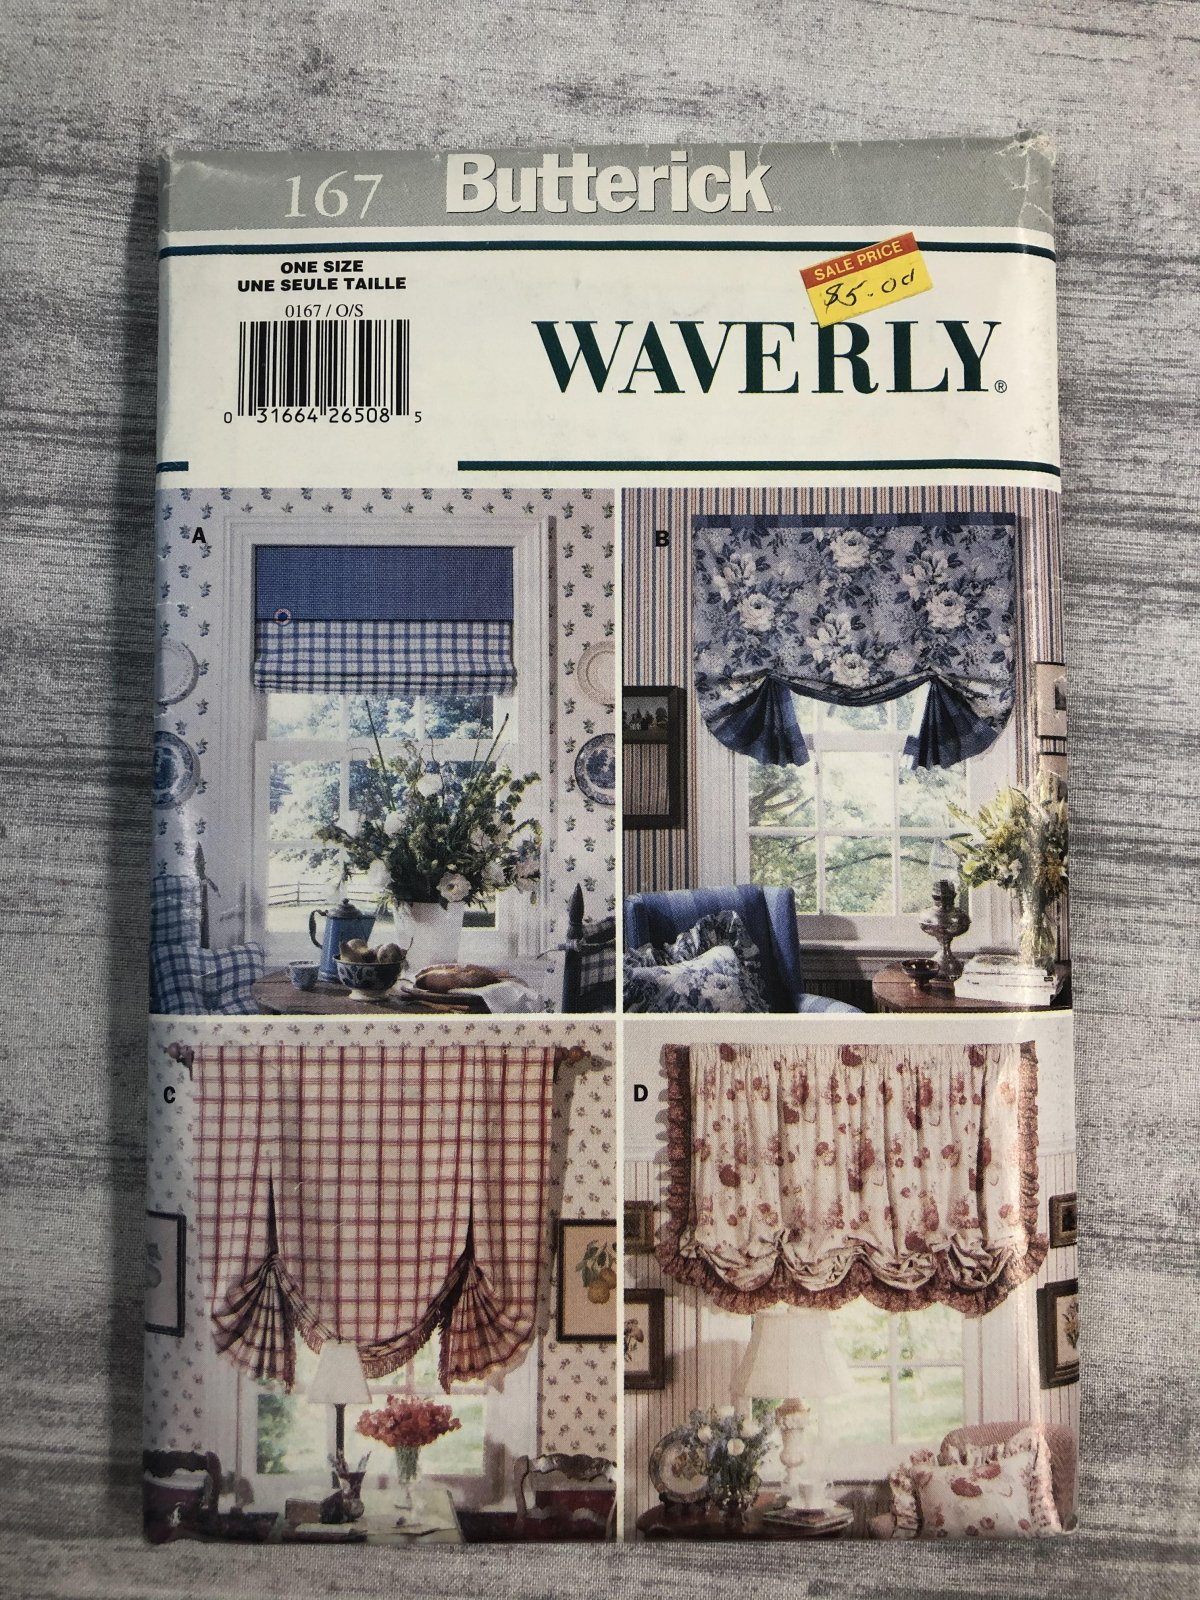 Butterick Waverly 0167